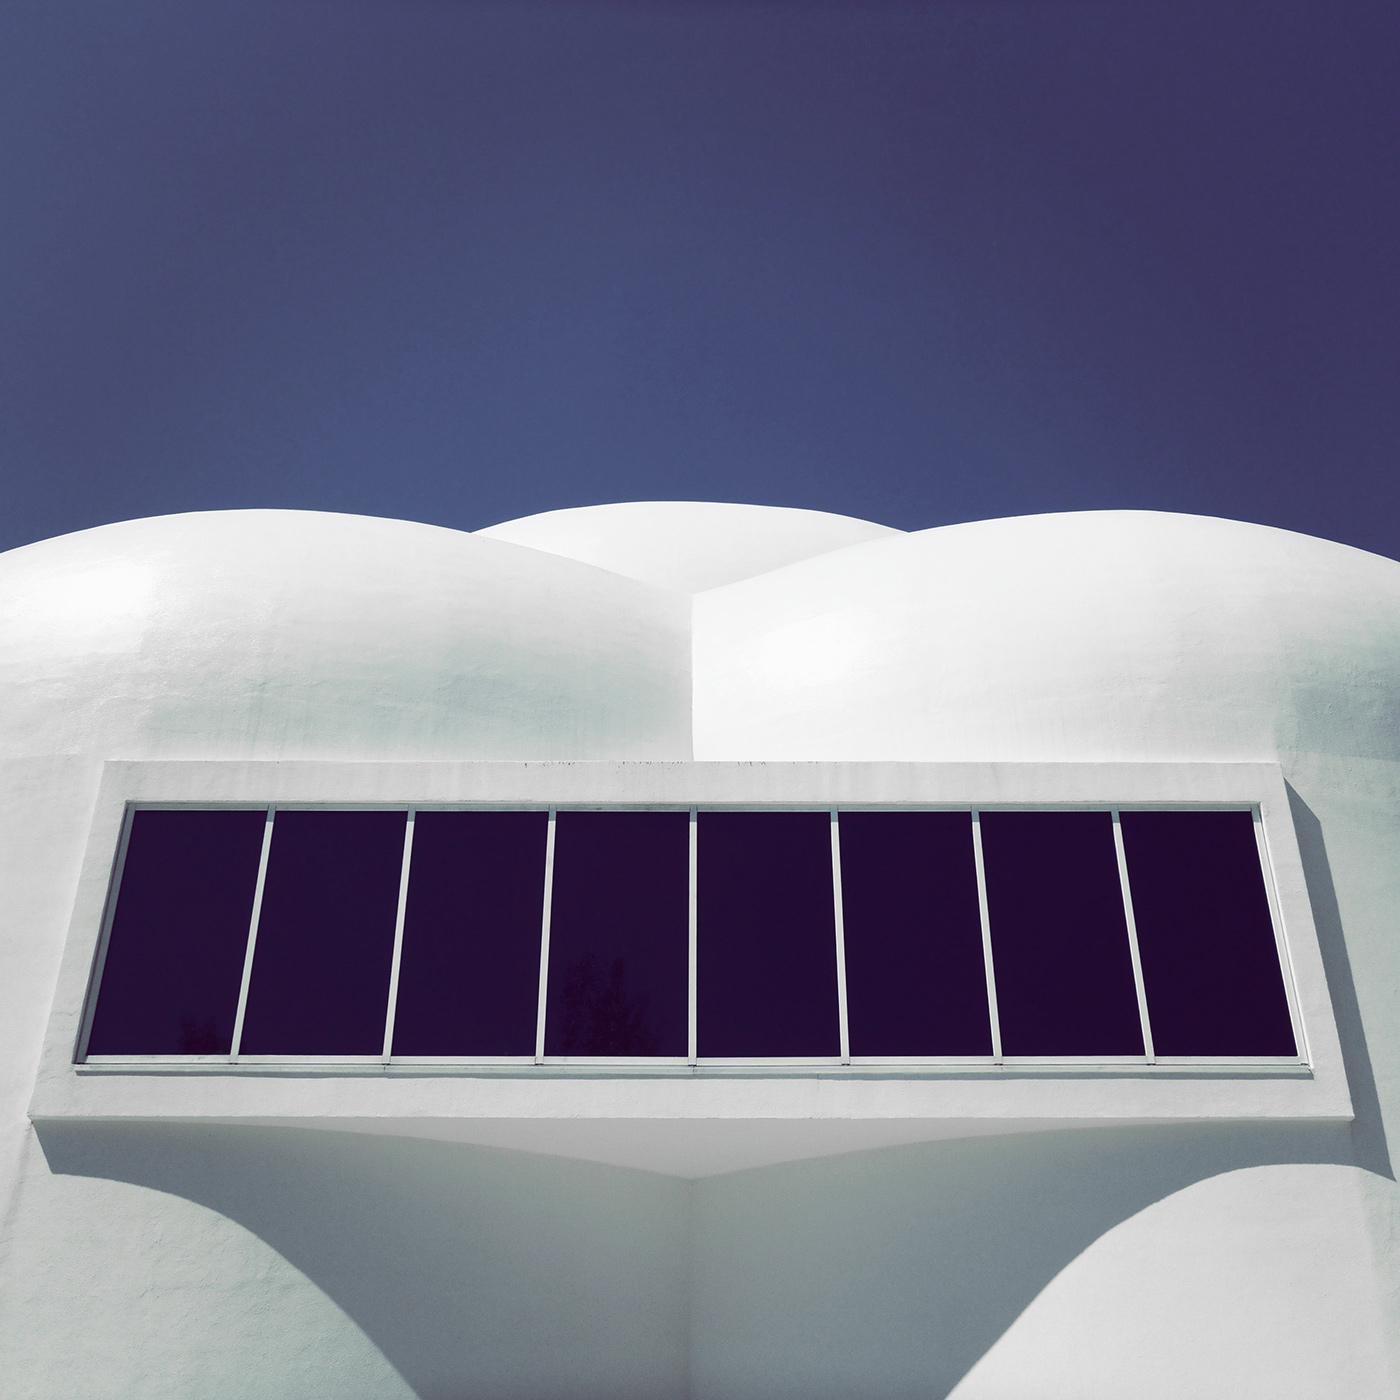 Korea Pavilion Expo 2015 <br />Location: Milano, Italy <br />Architect: Archiban, Seoul